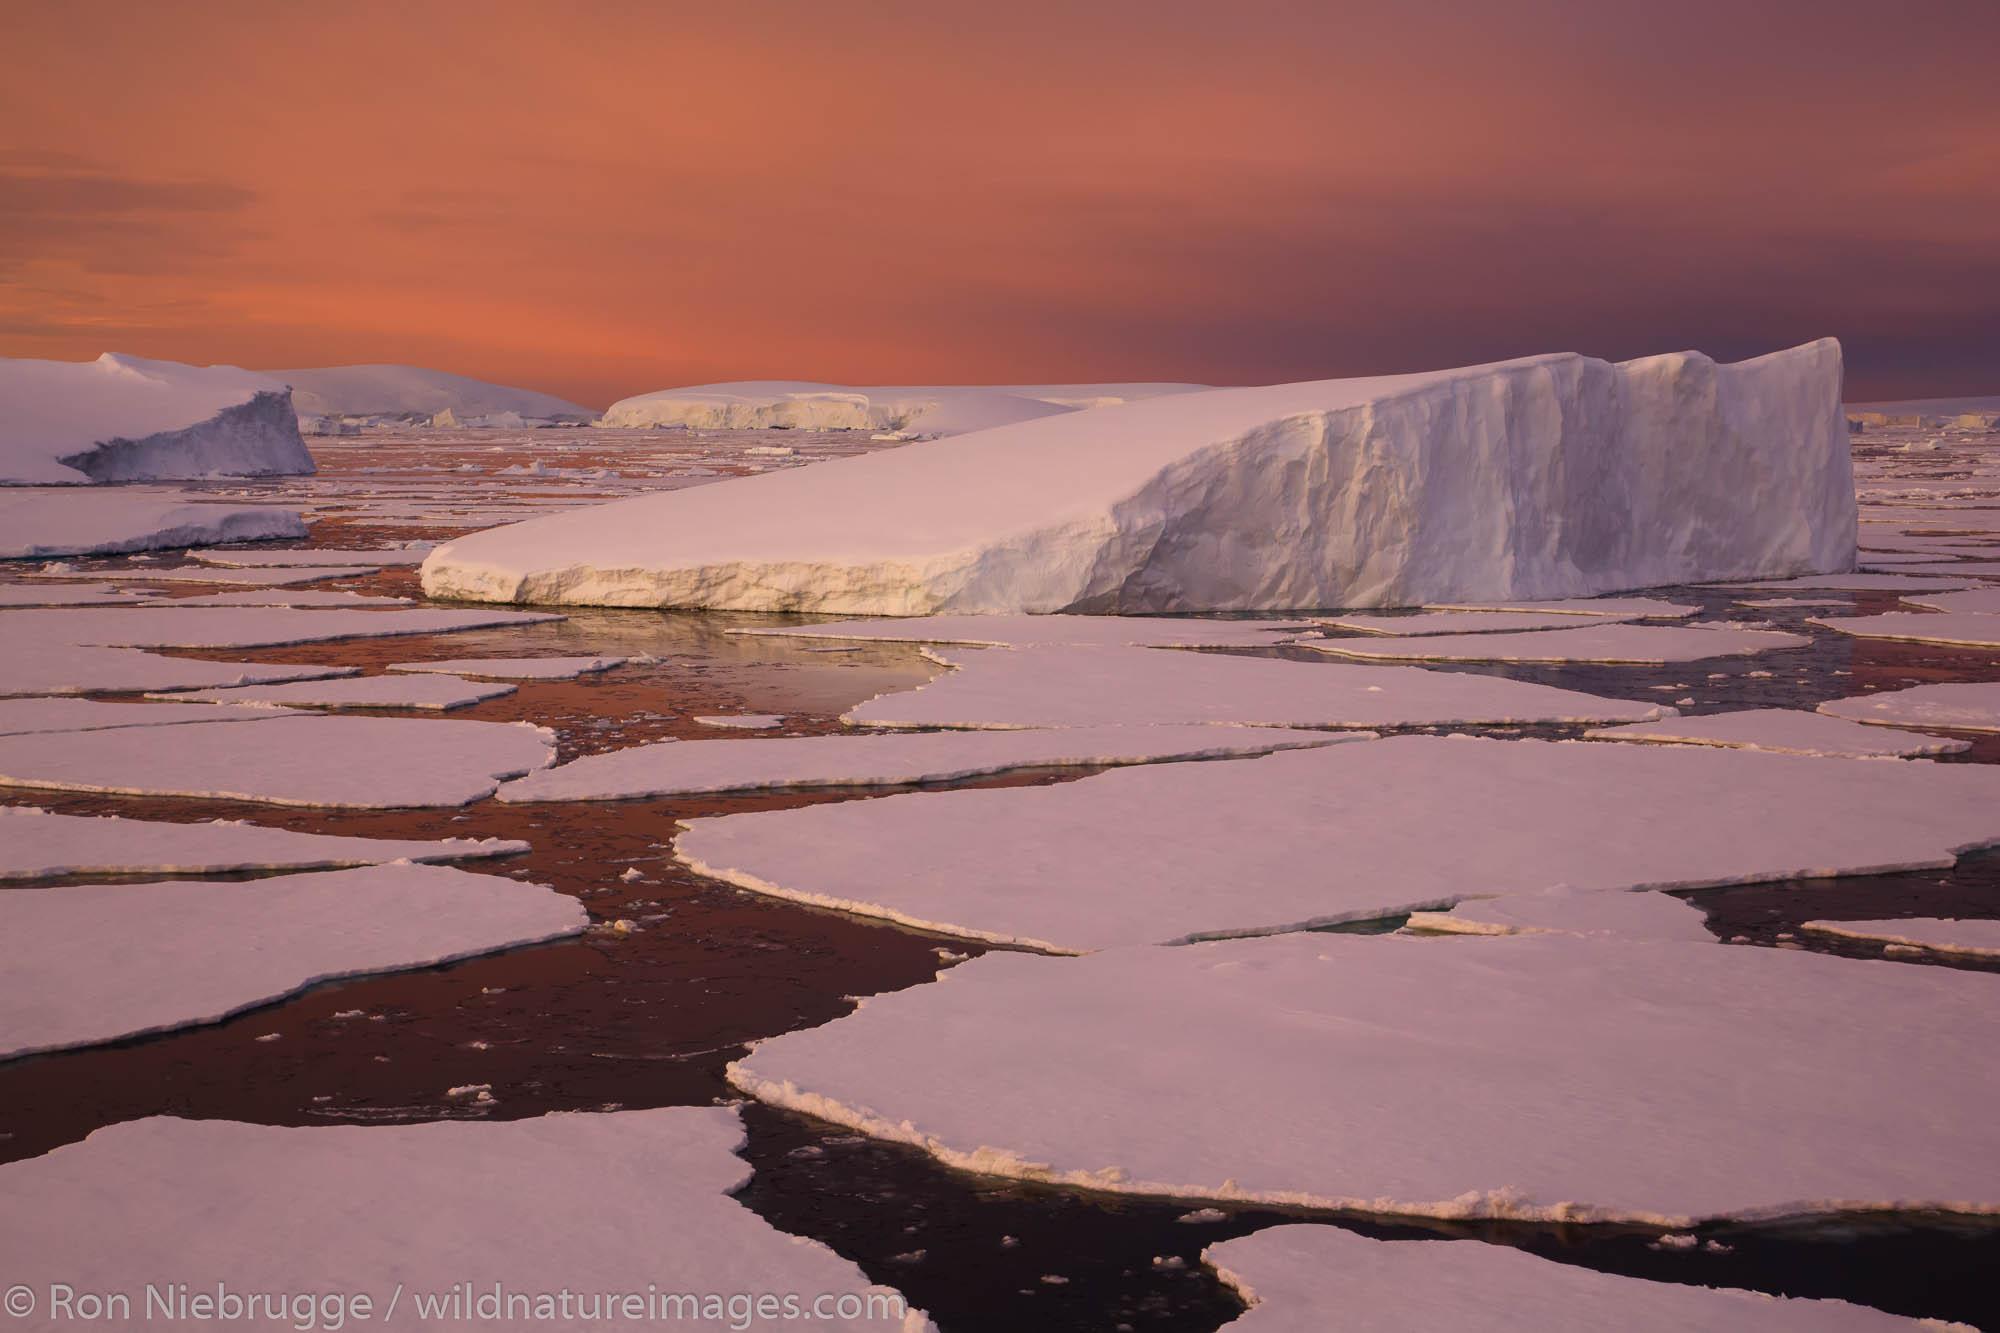 Sunset / sunrise as we travel below the Antarctic Circle, Antarctica.